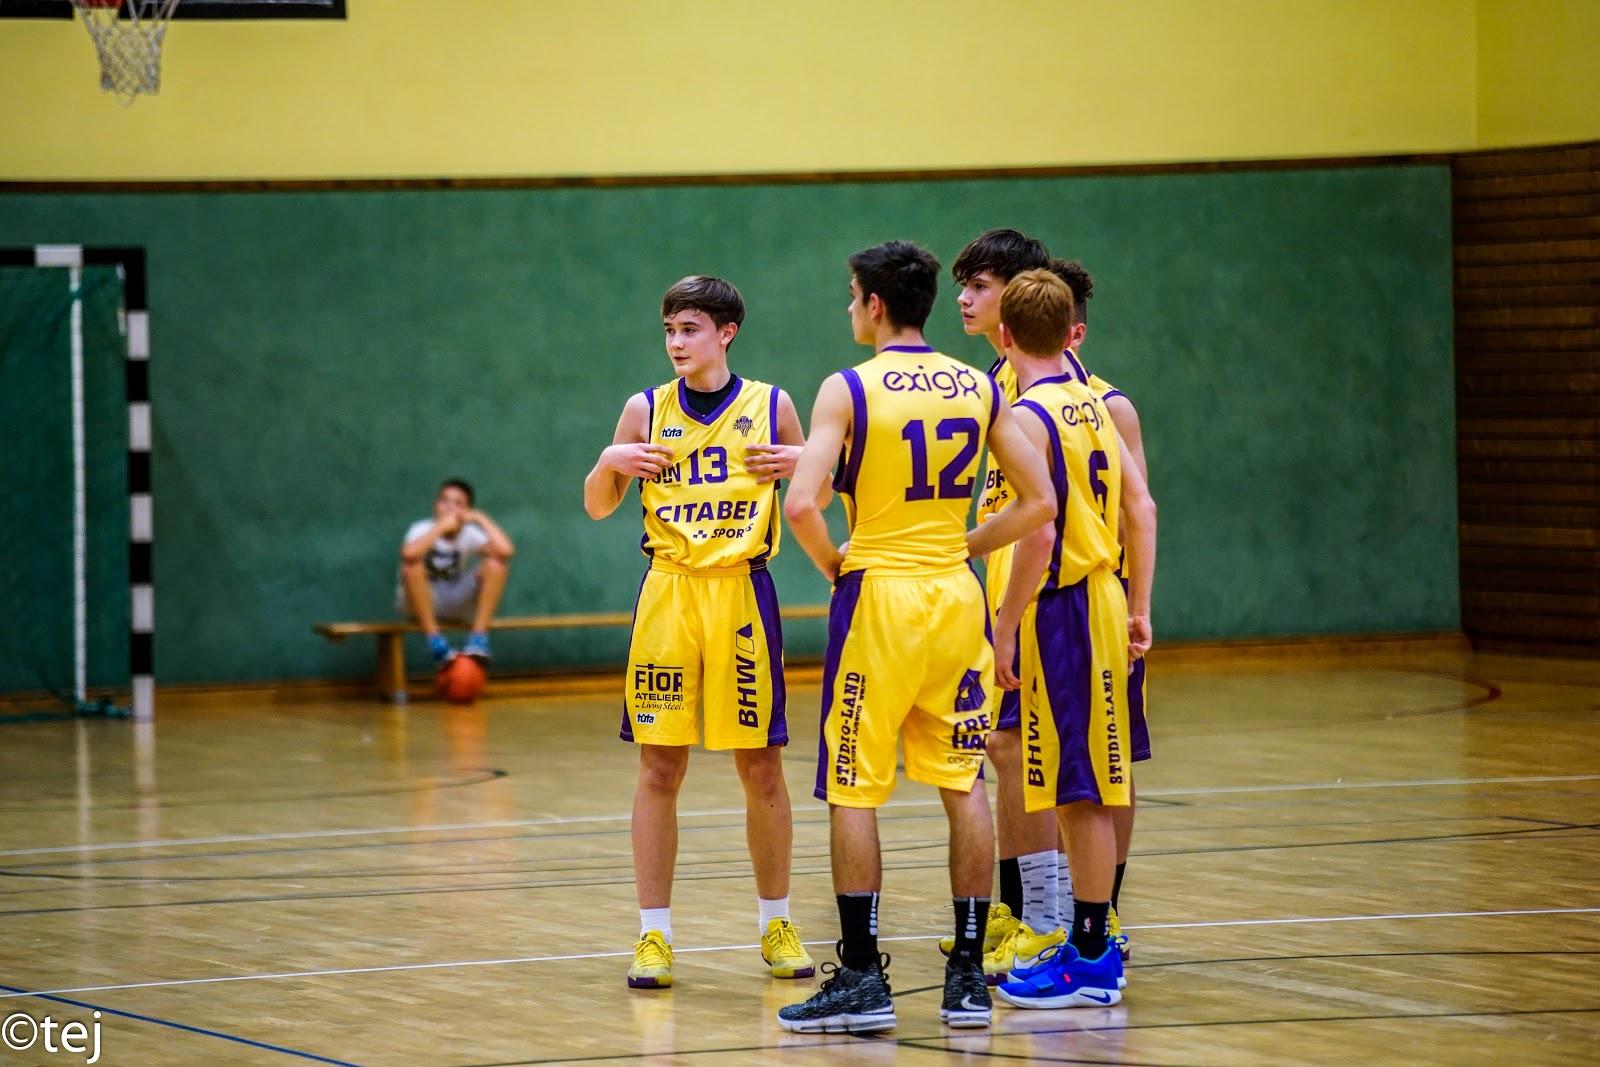 Scolaires 2018/2019  Sparta - Amicale